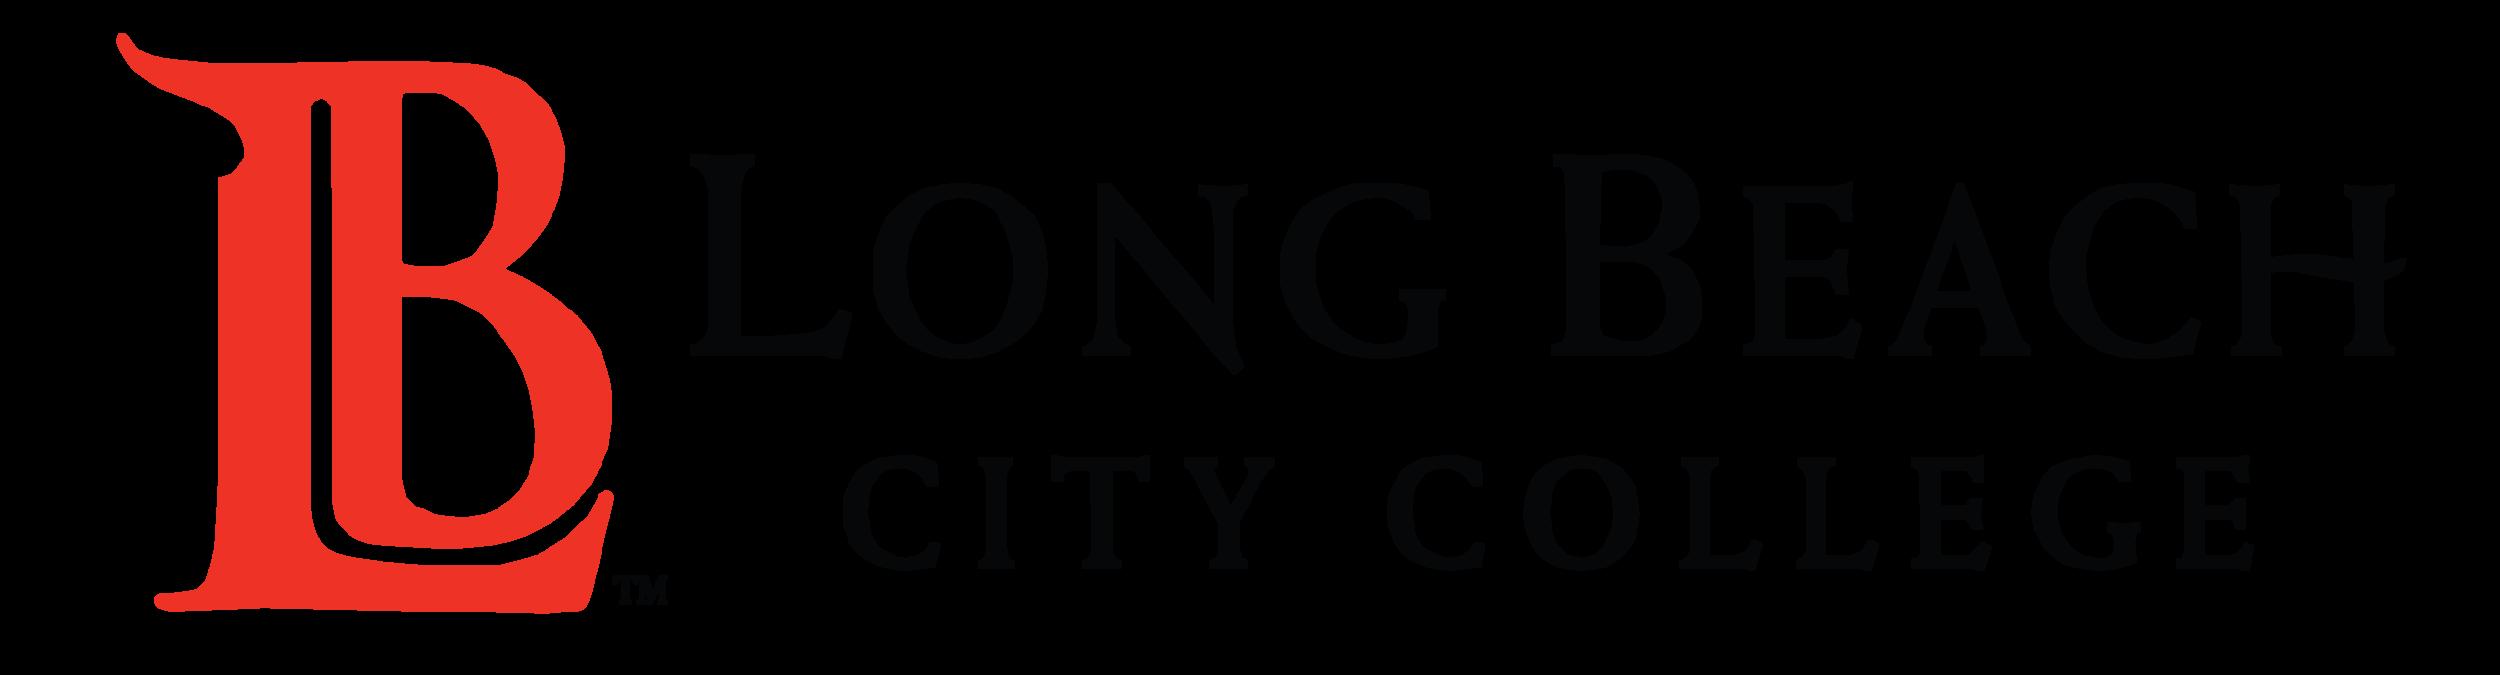 Long Beach College Logo.png